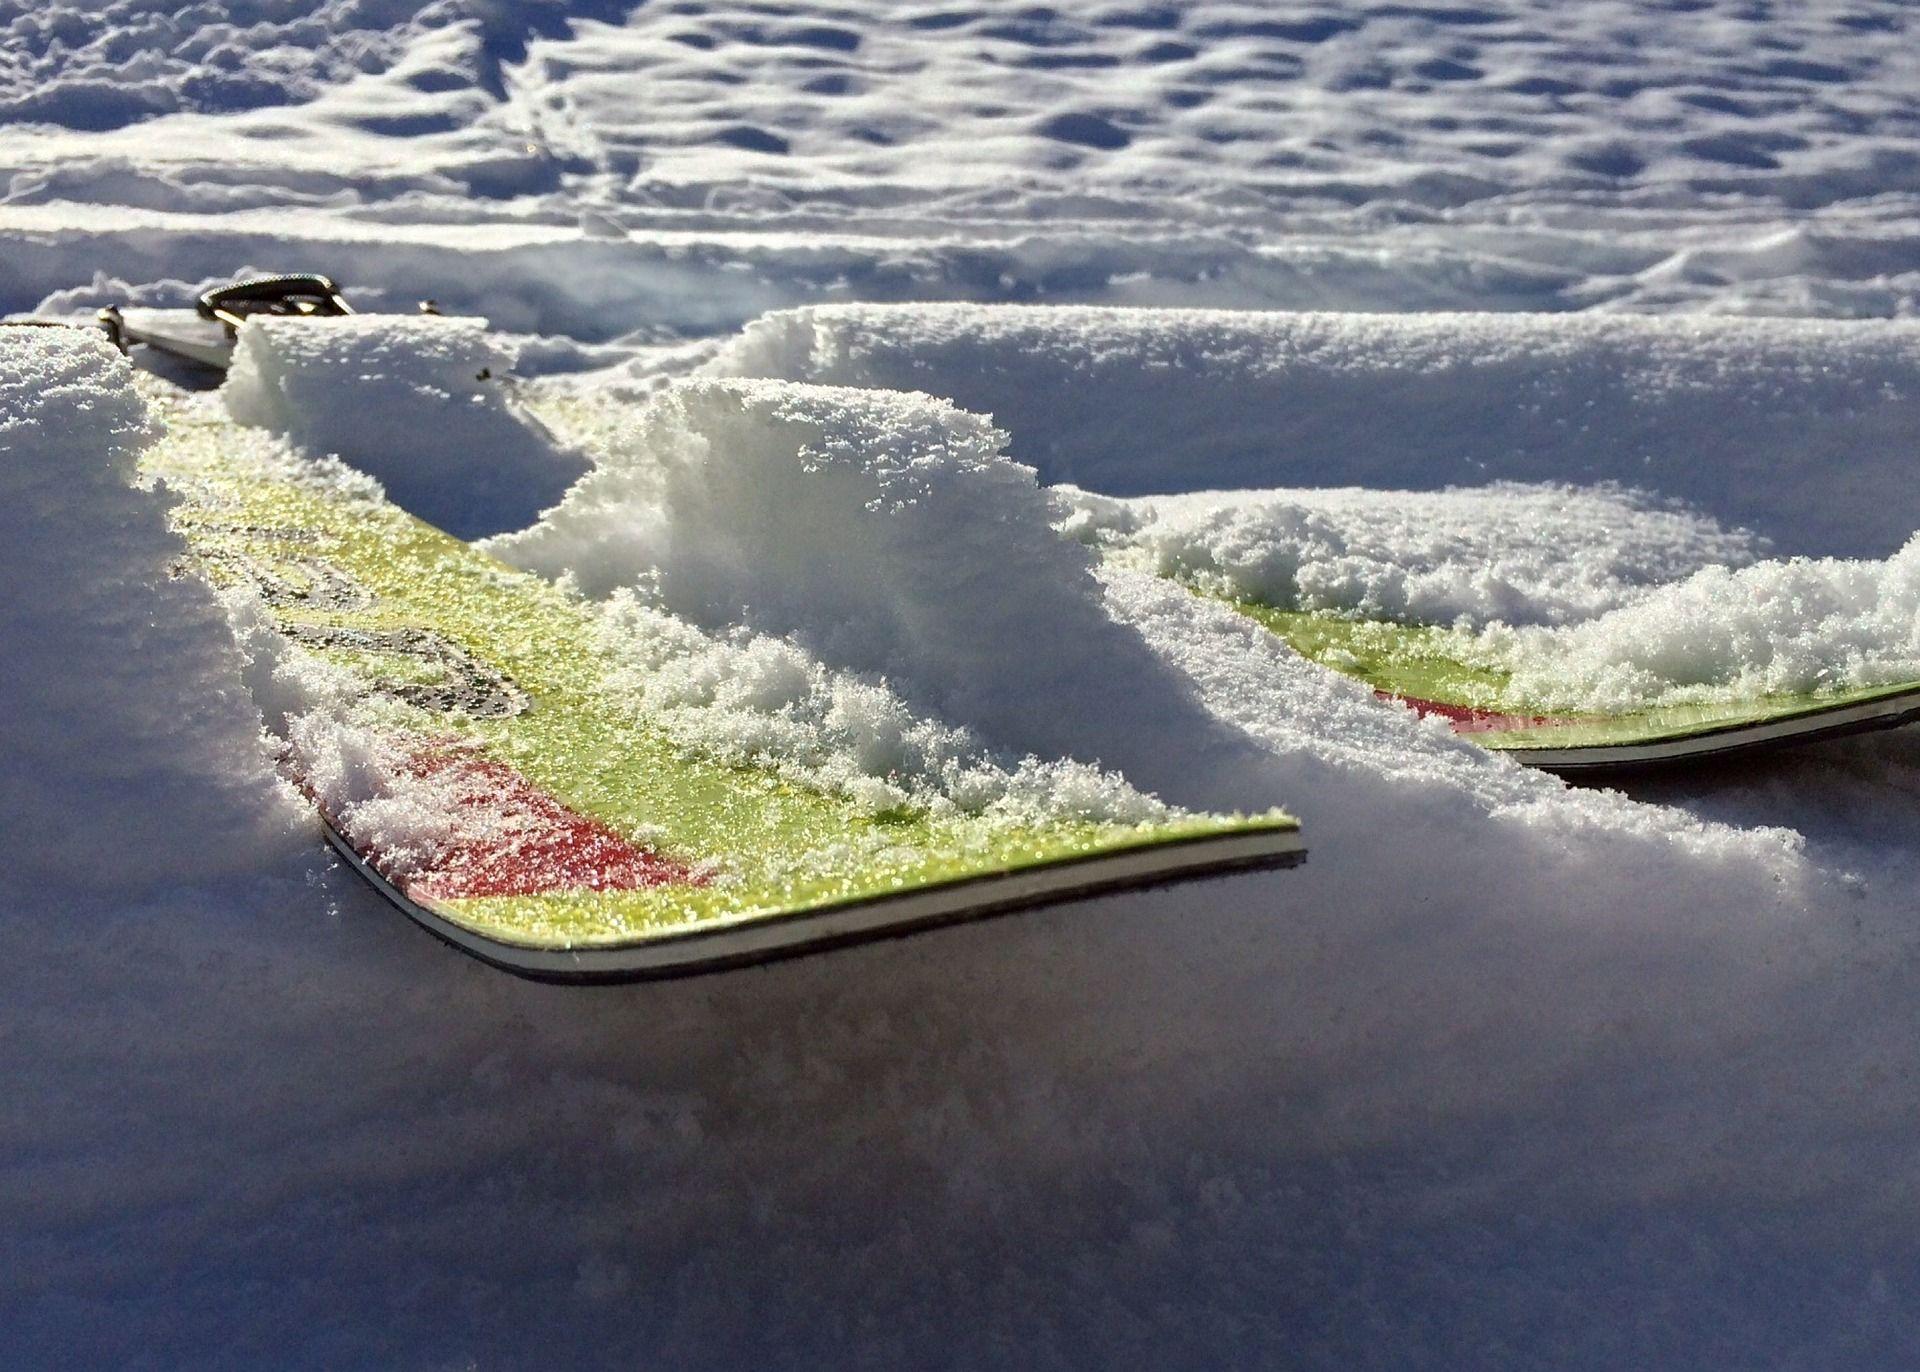 richard freitag skispringen